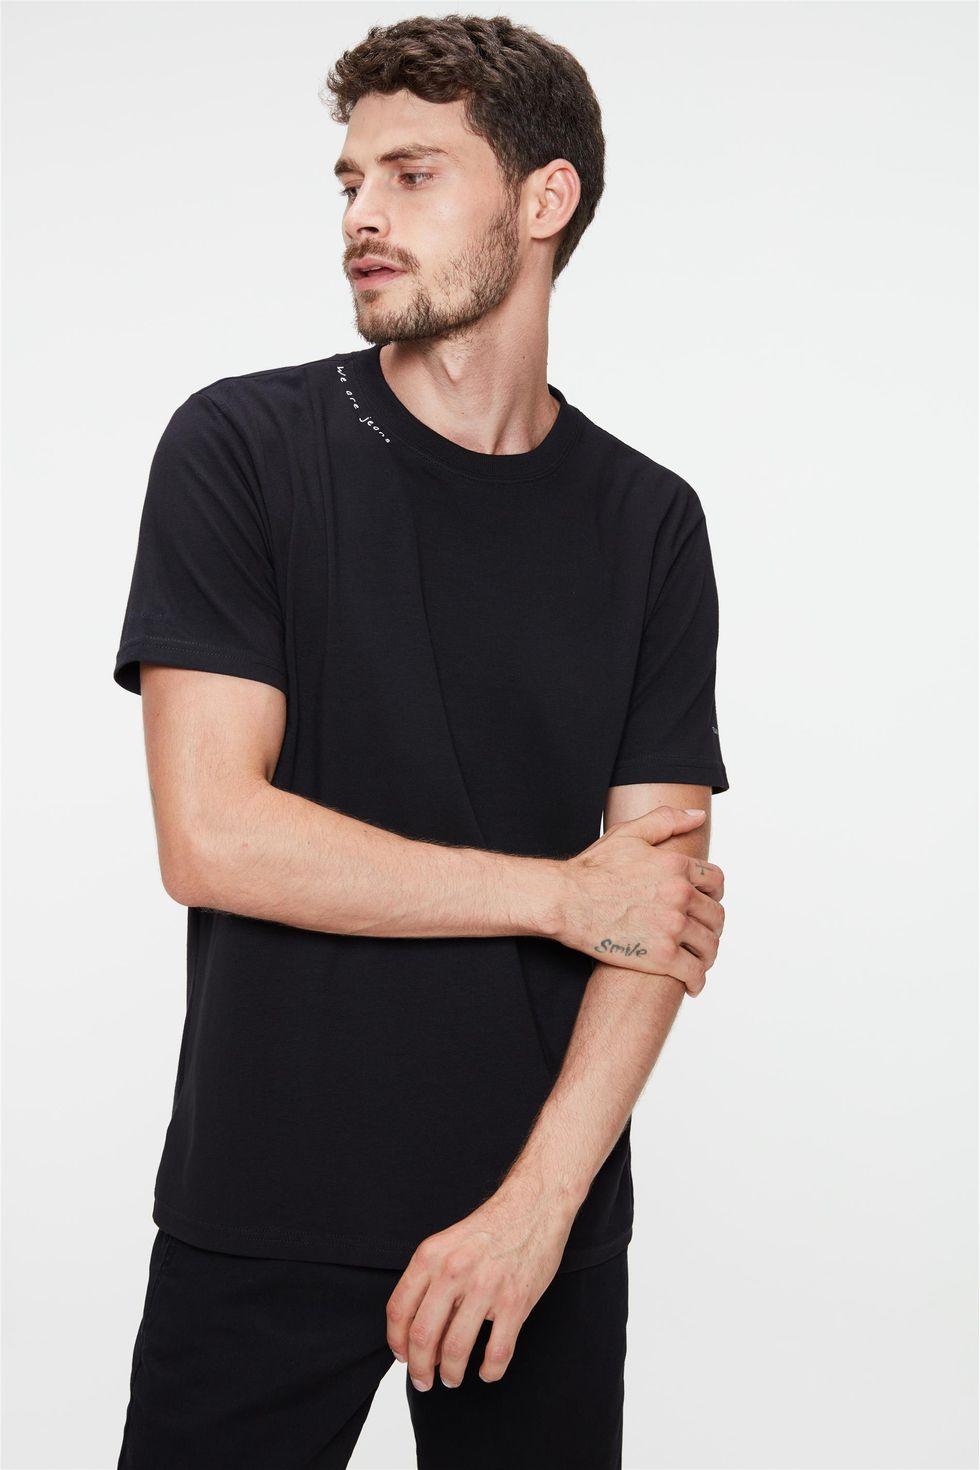 Camiseta-Estampa-We-Are-Jeans-Masculina-Frente--